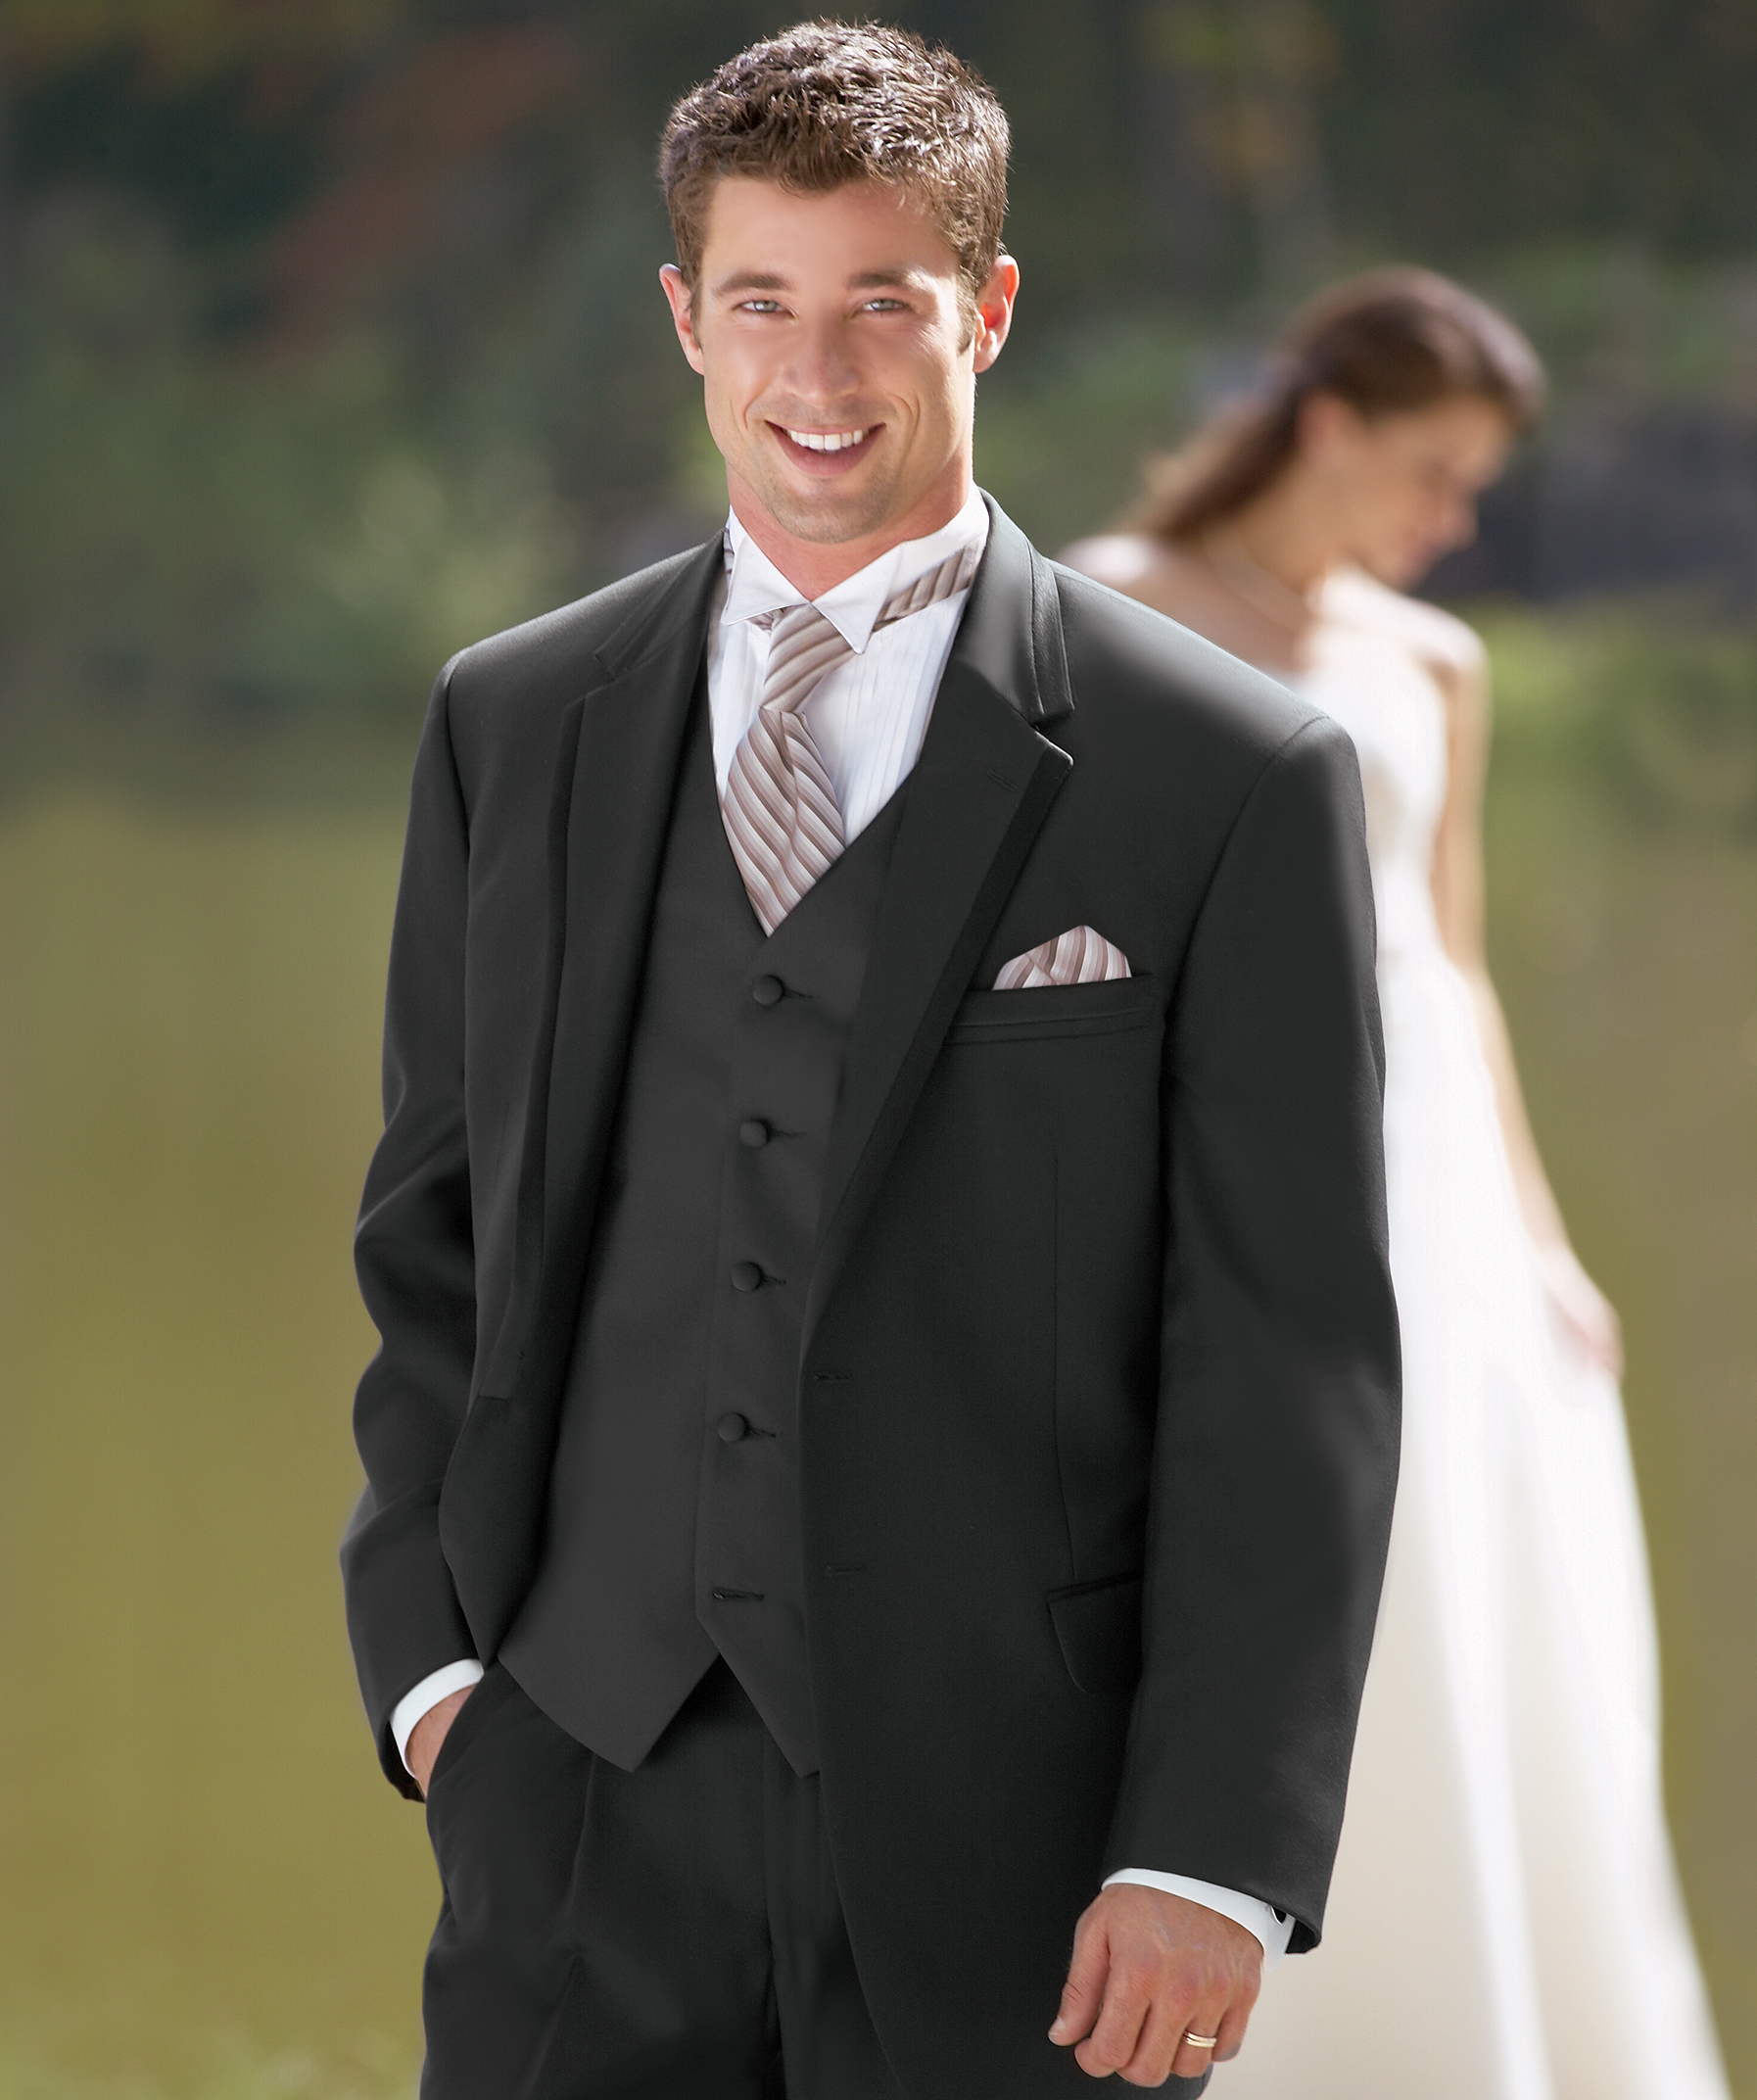 San Angelo Tuxedos & Formal Wear » Bridal